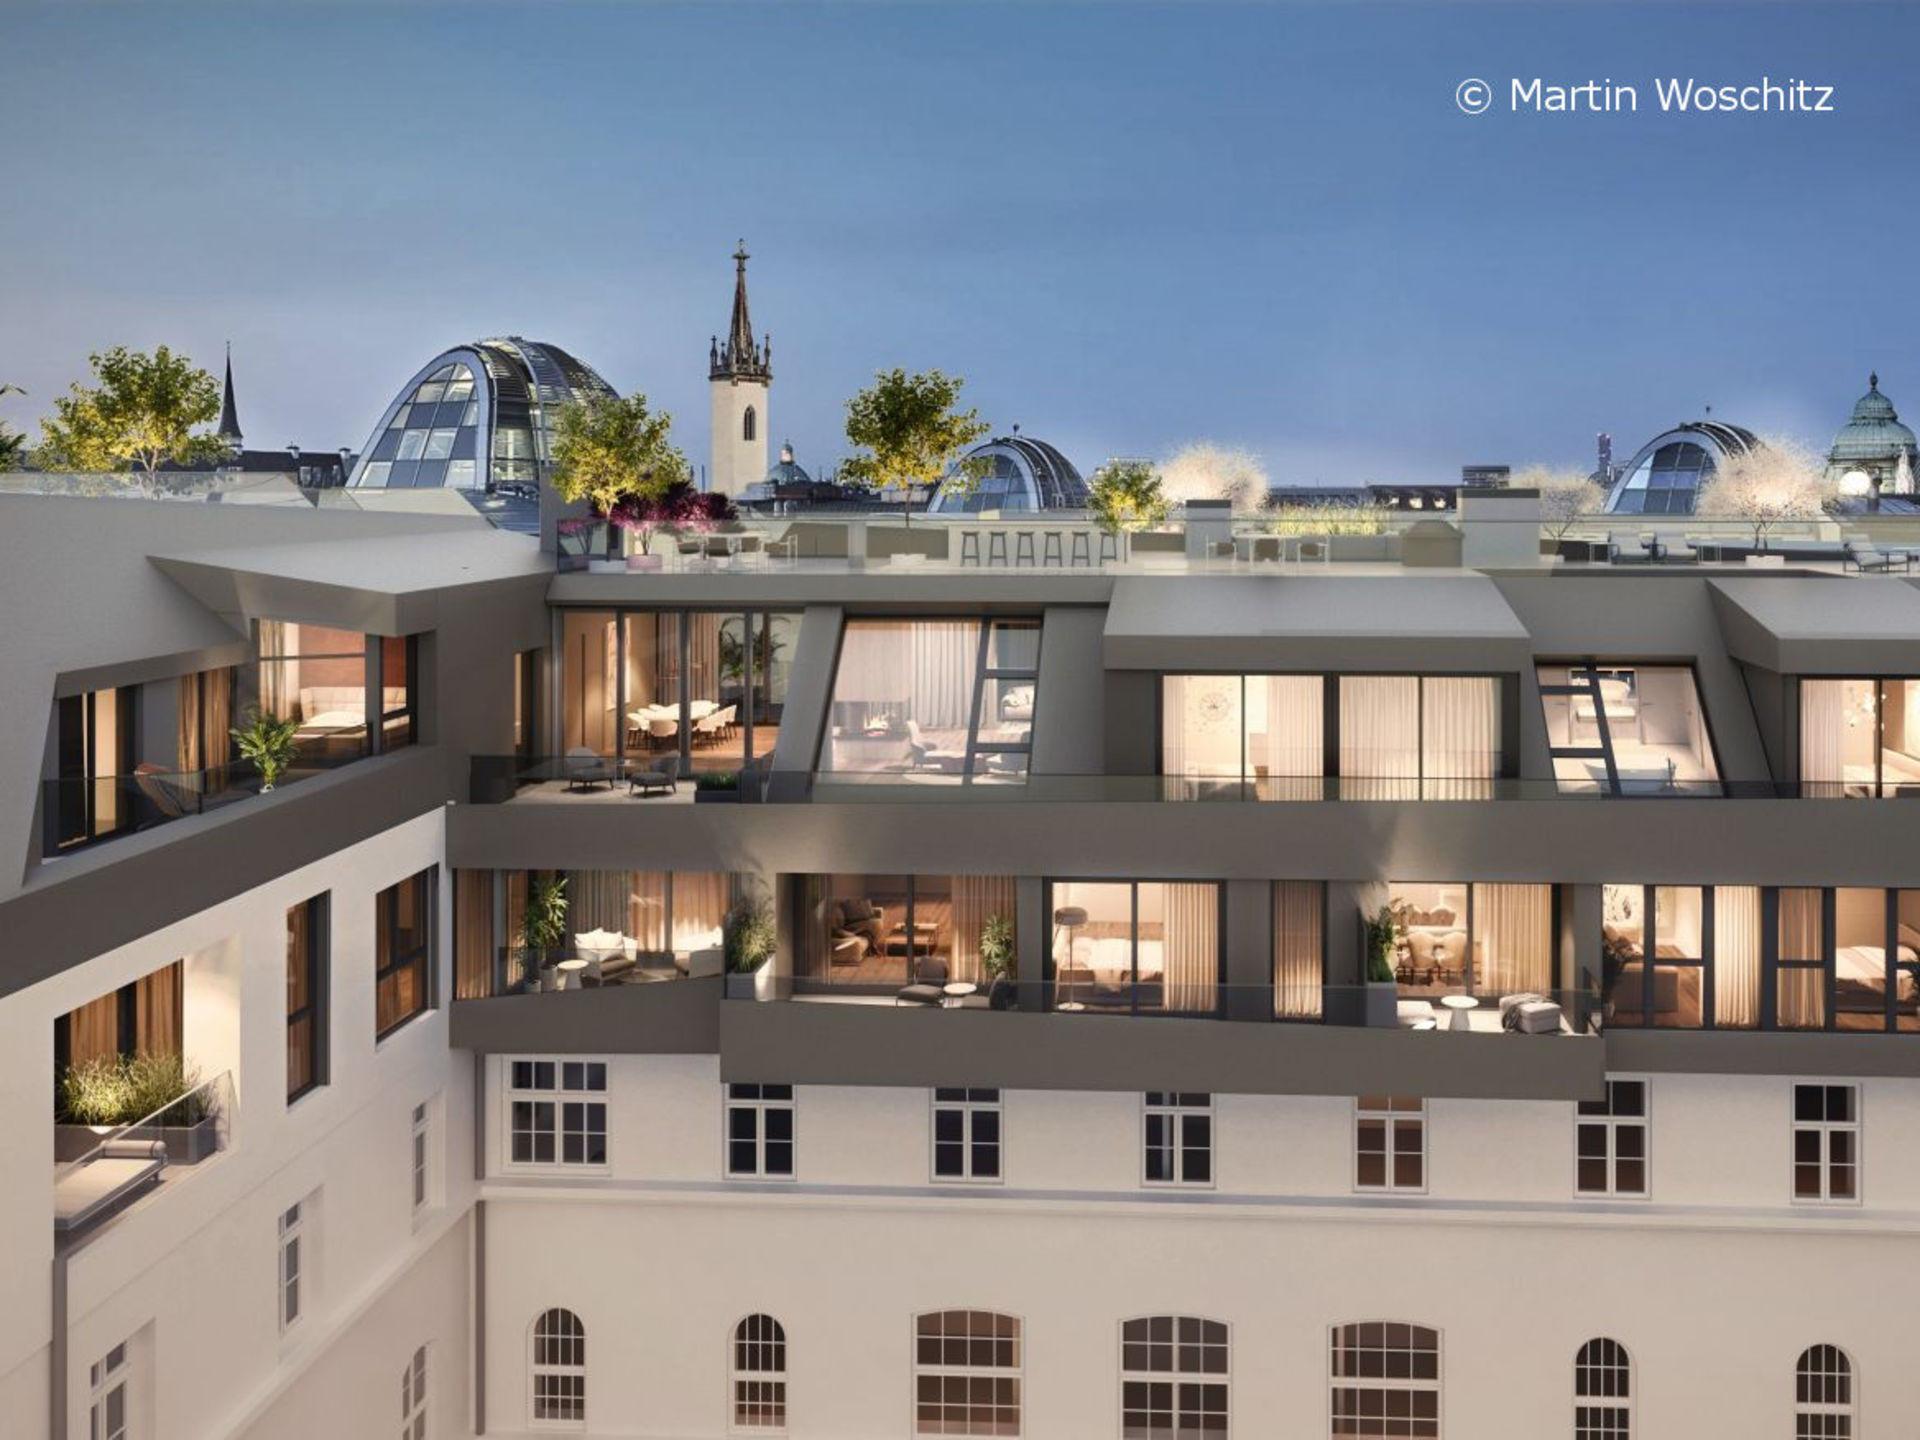 Luxus-Eigentumswohnungen im Herzen Wiens - Goethegasse 1